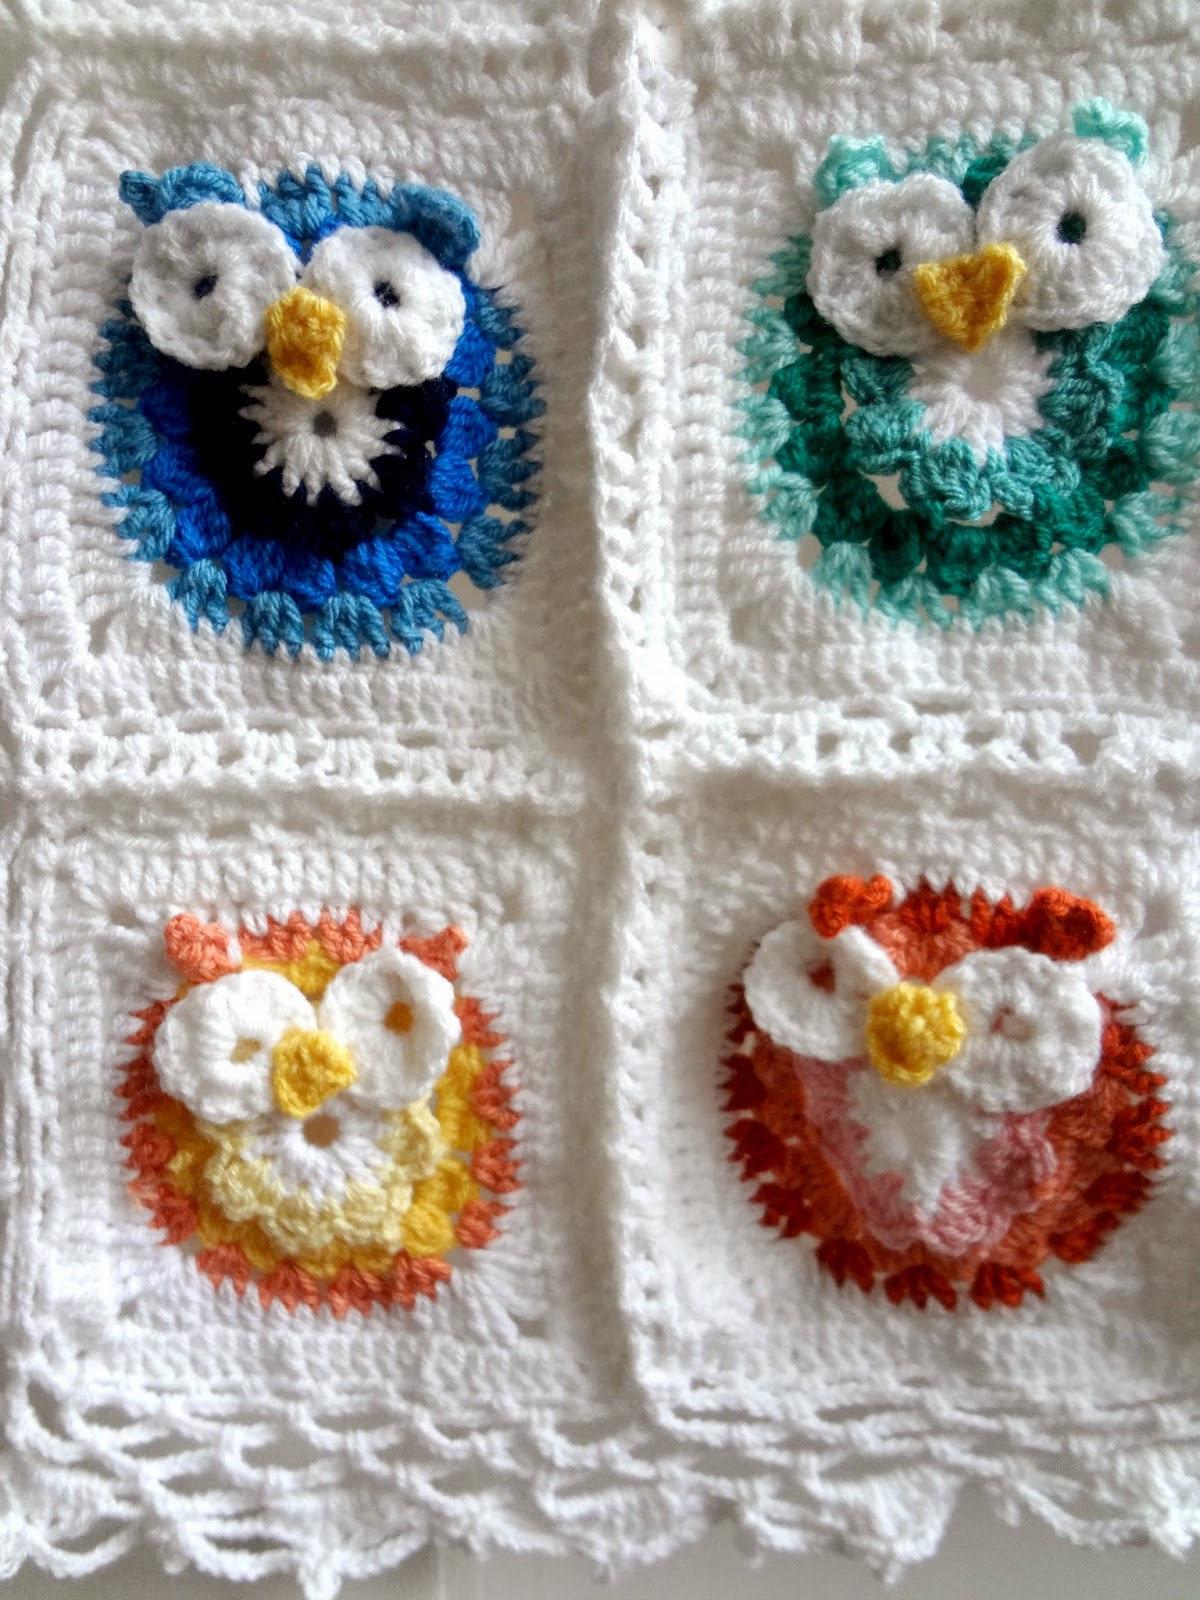 Little treasures crochet owl blanket pattern crochet owl blanket pattern bankloansurffo Image collections